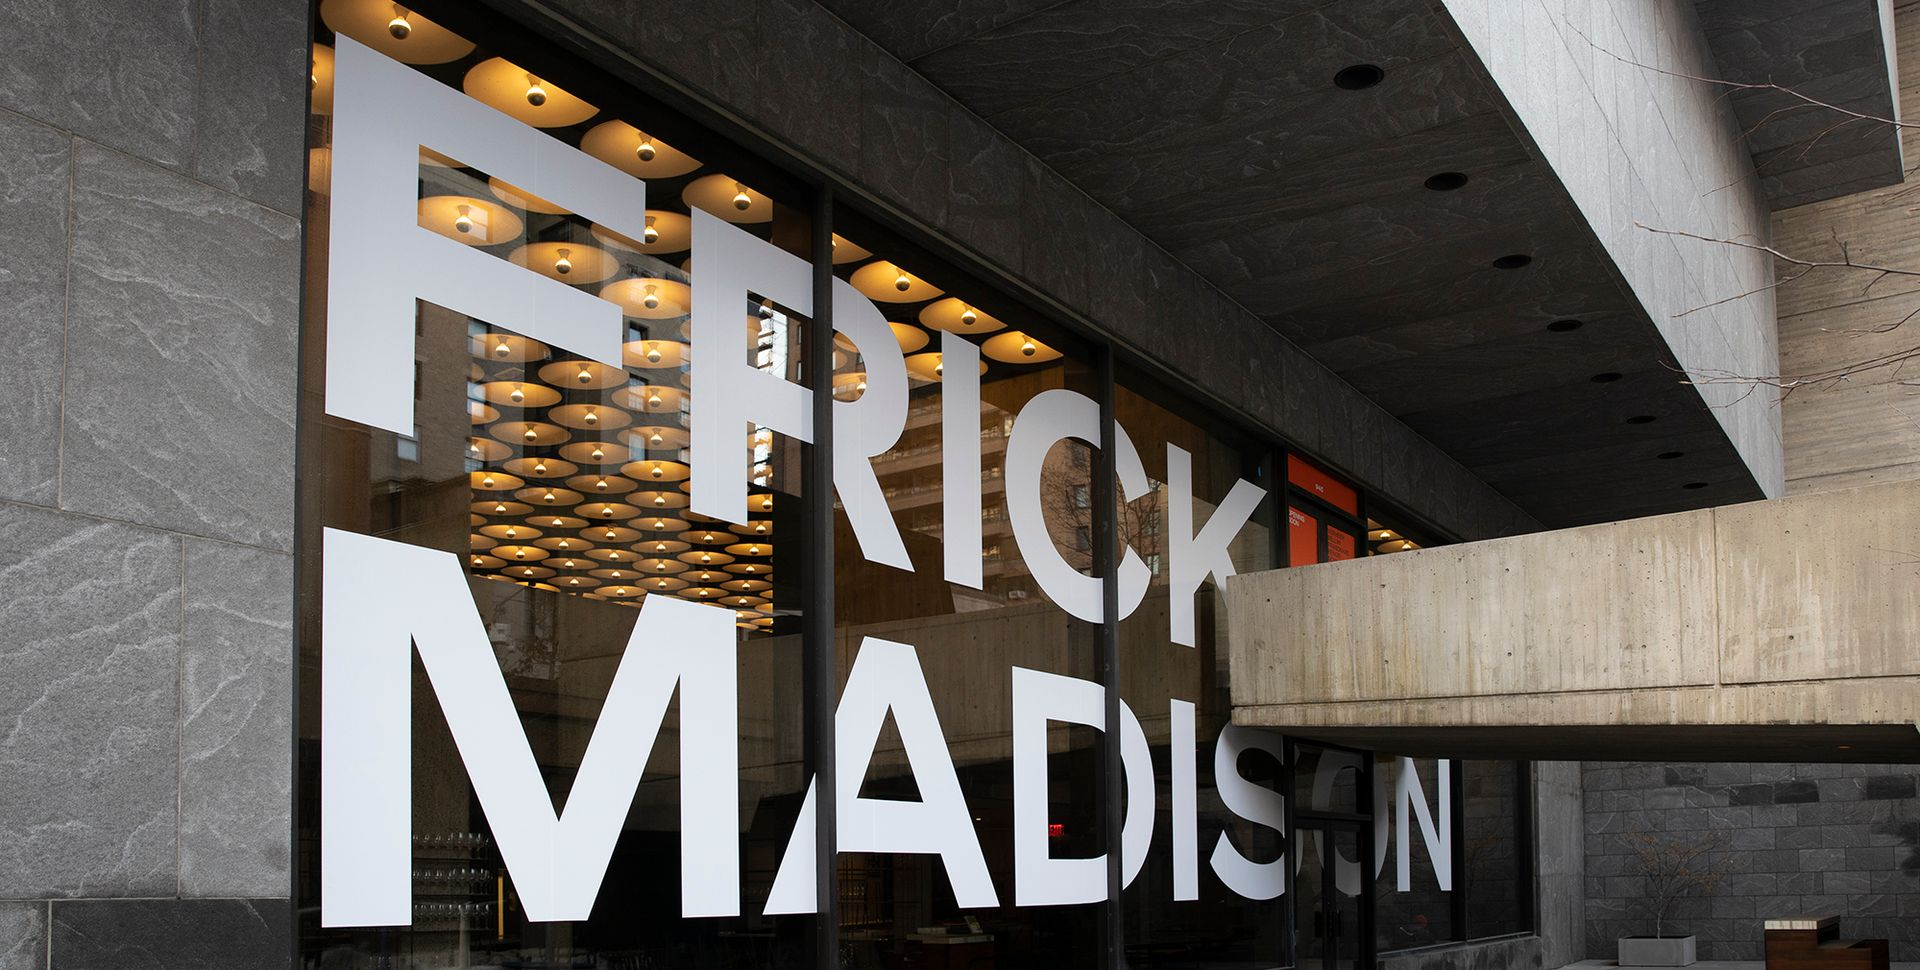 Exterior of Frick Madison Photo: Joe Coscia